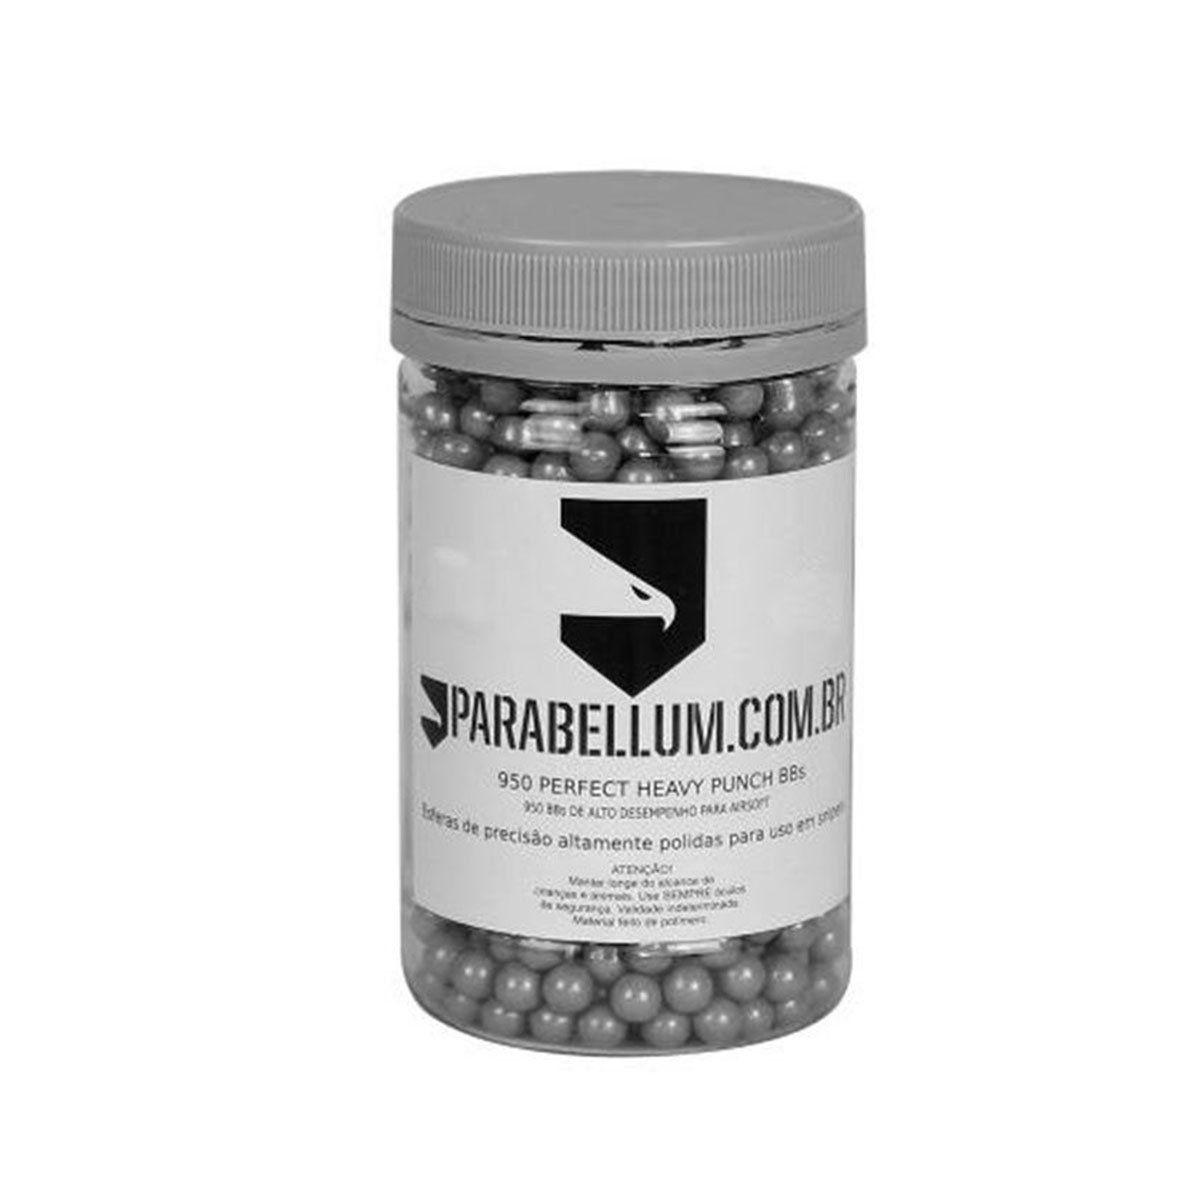 Esferas Plásticas BBs Parabellum Calibre 6mm 0,42g 950un